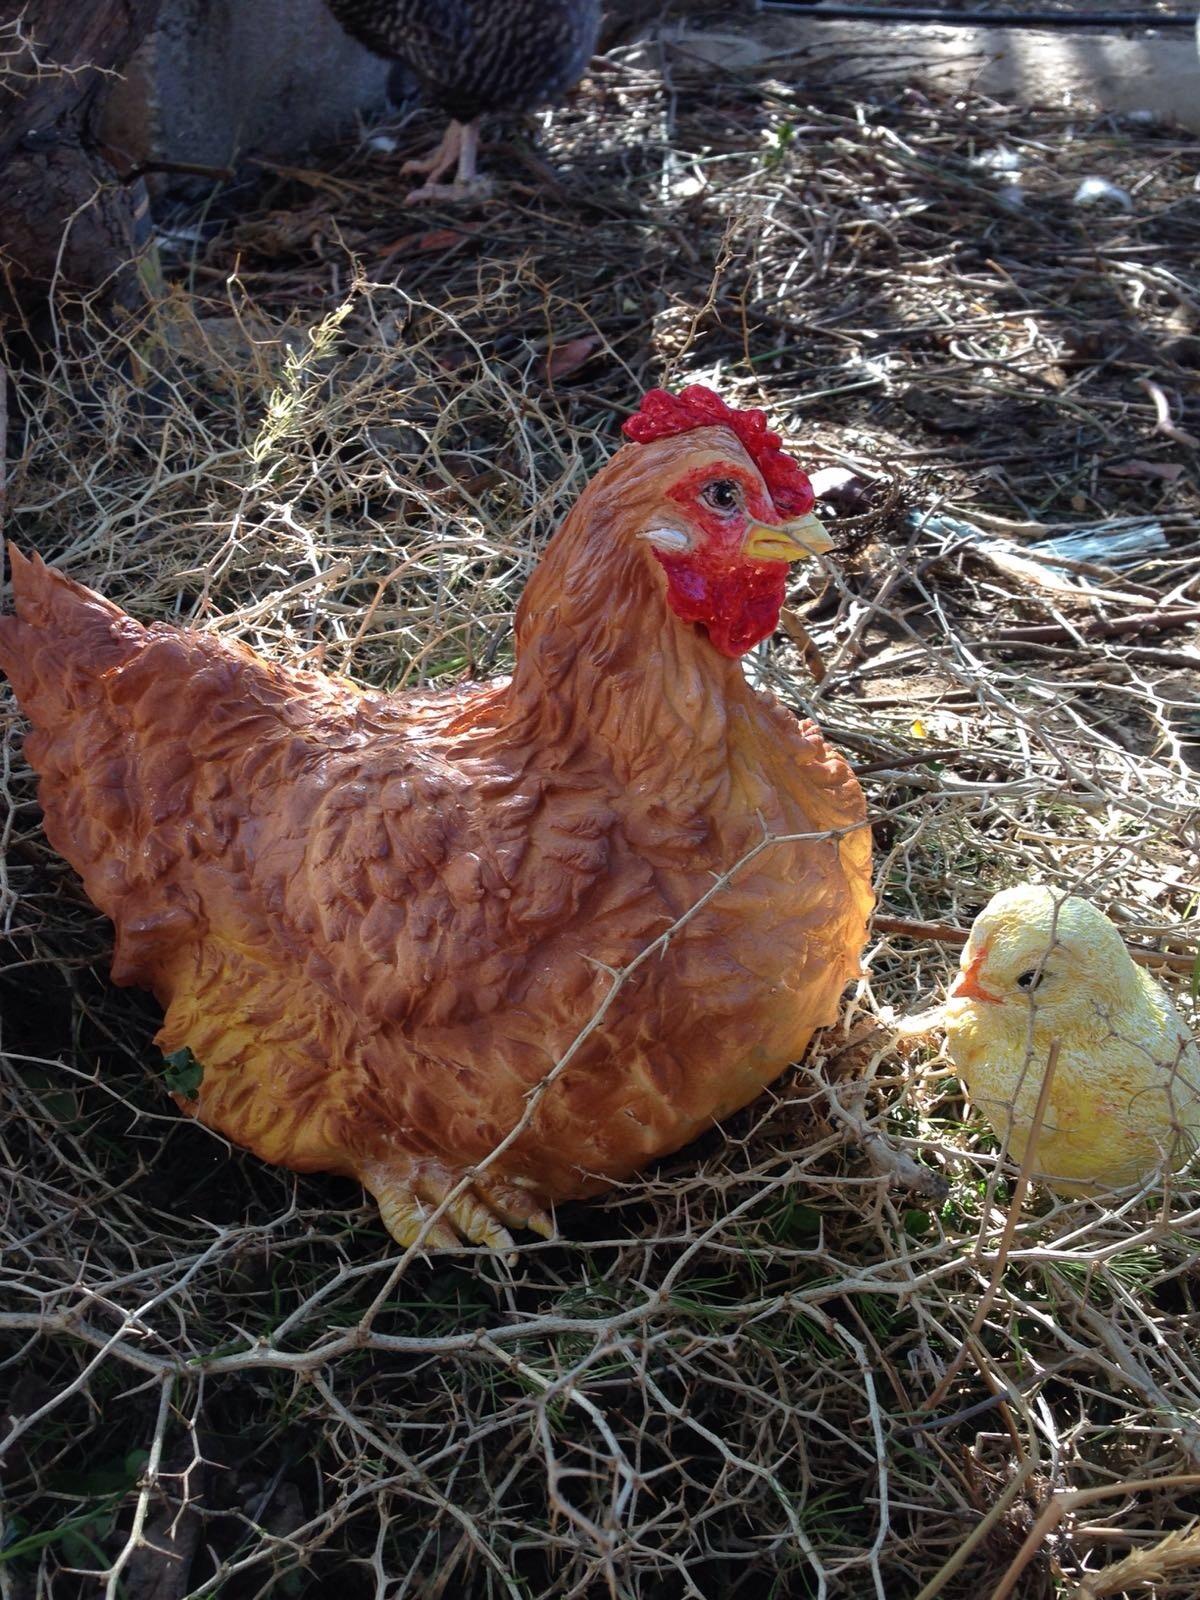 Animal-Rights-Maria-Teresa-Gil-Layunta-Chicken.jpg#asset:13726